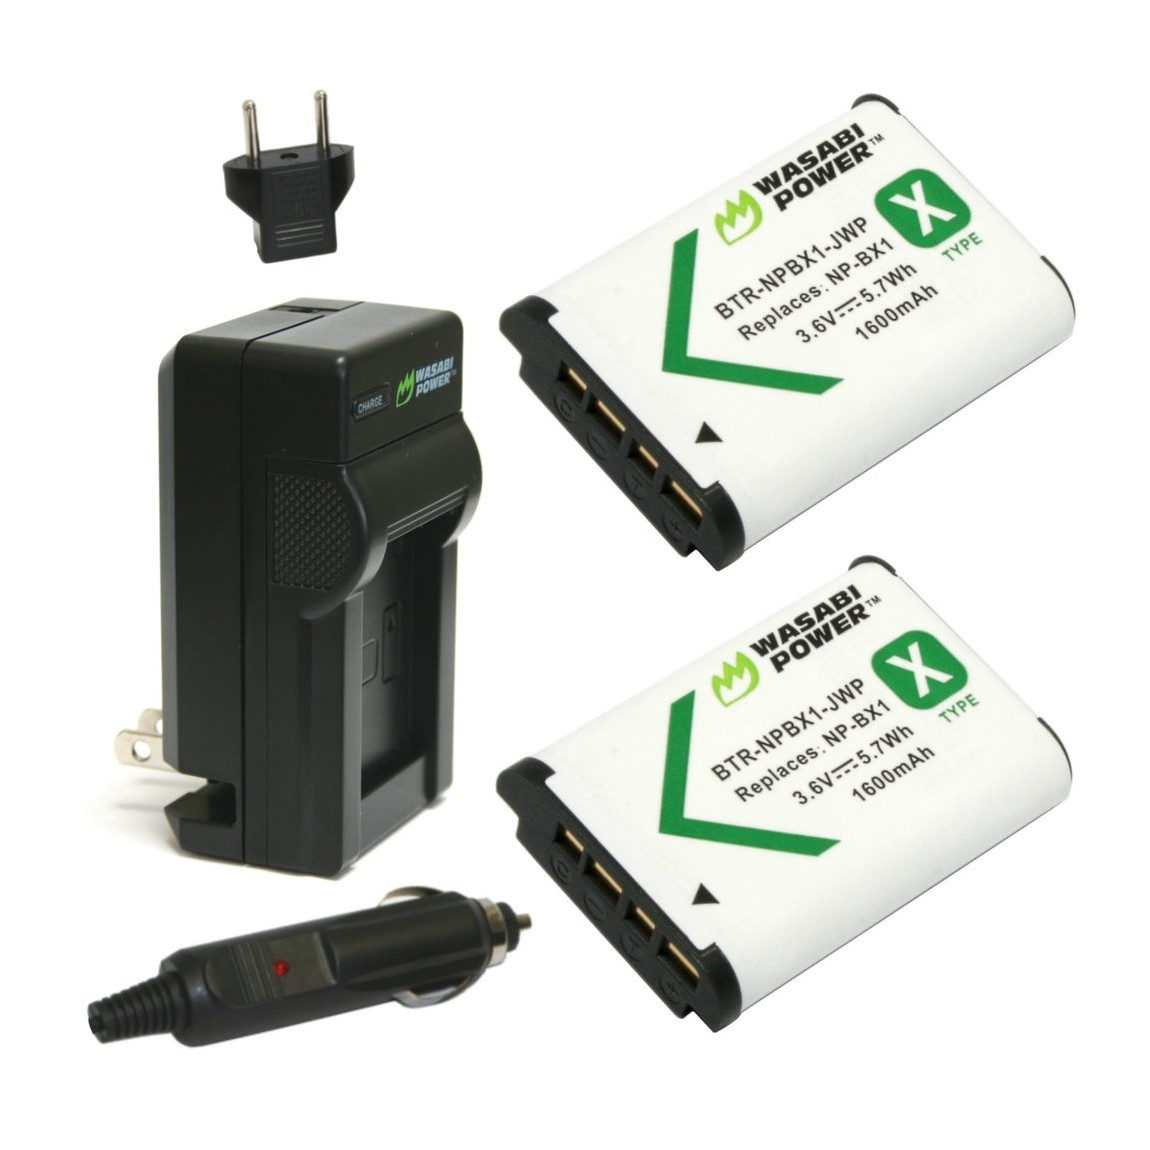 Wasabi Power Sony NP-BX1 Accu en Lader Kit